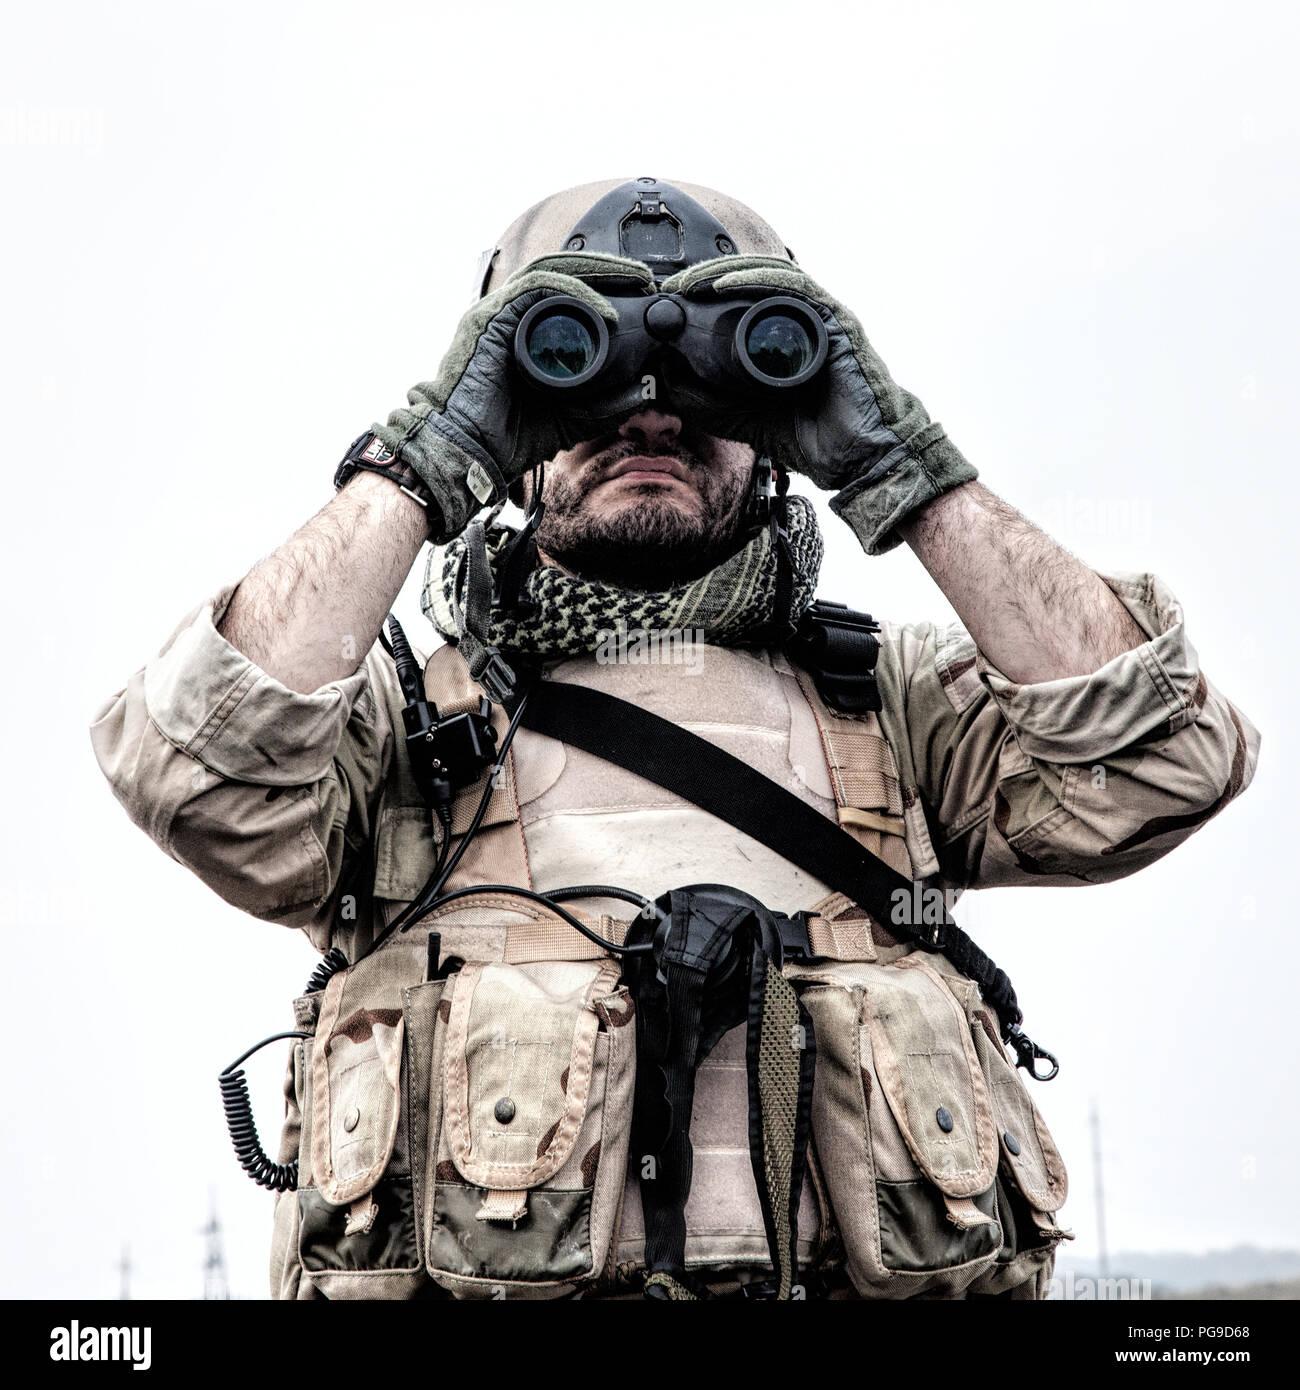 Commando soldier using binoculars to observe terrain - Stock Image